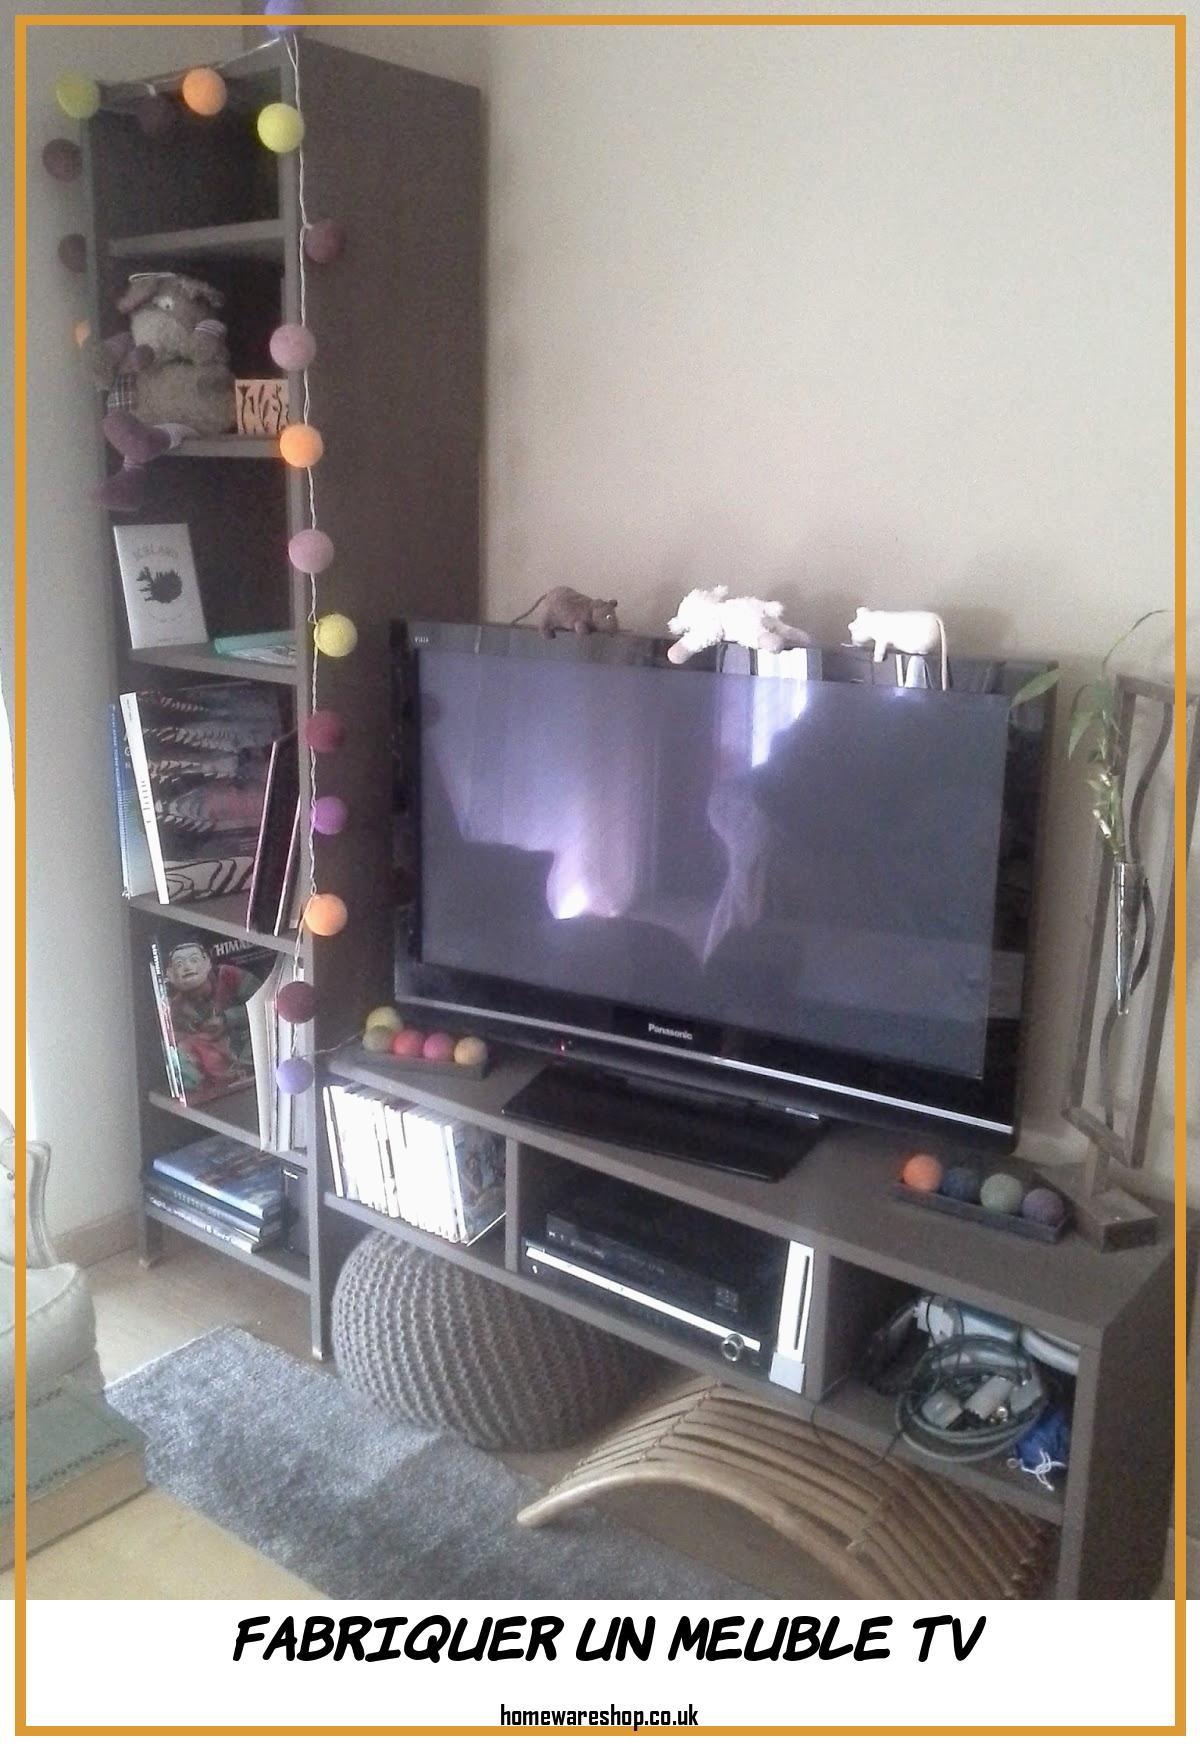 Phenomenal Fabriquer Un Meuble Tv Homewareshop Dedans Fabriquer Un Meuble Tv En Bois Agencecormierdelauniere Com Agencecormierdelauniere Com